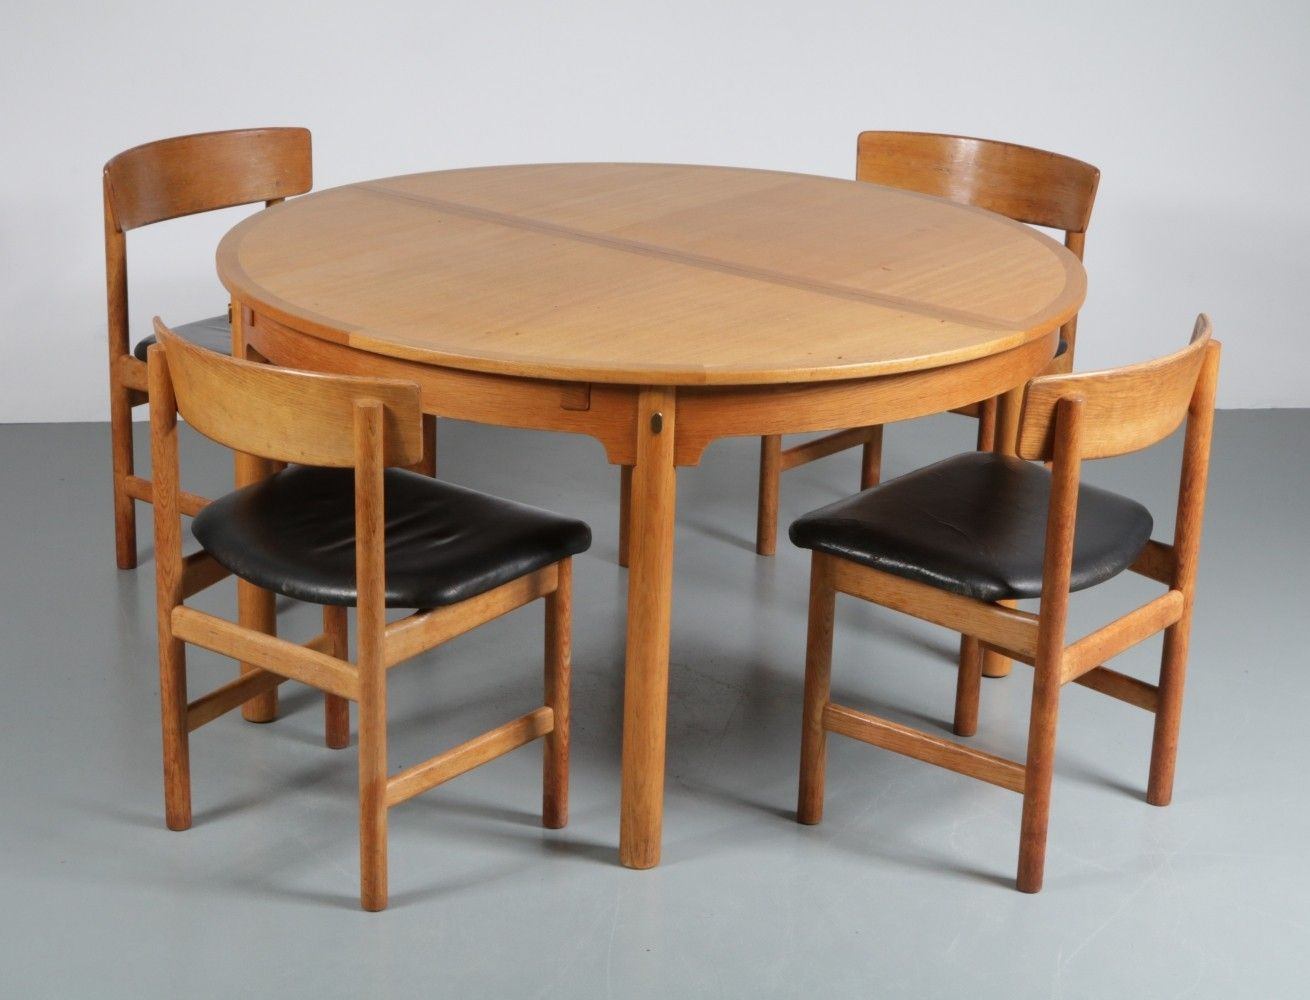 Dinner set by Børge Mogensen for Karl Andersson & Söner, 1950s